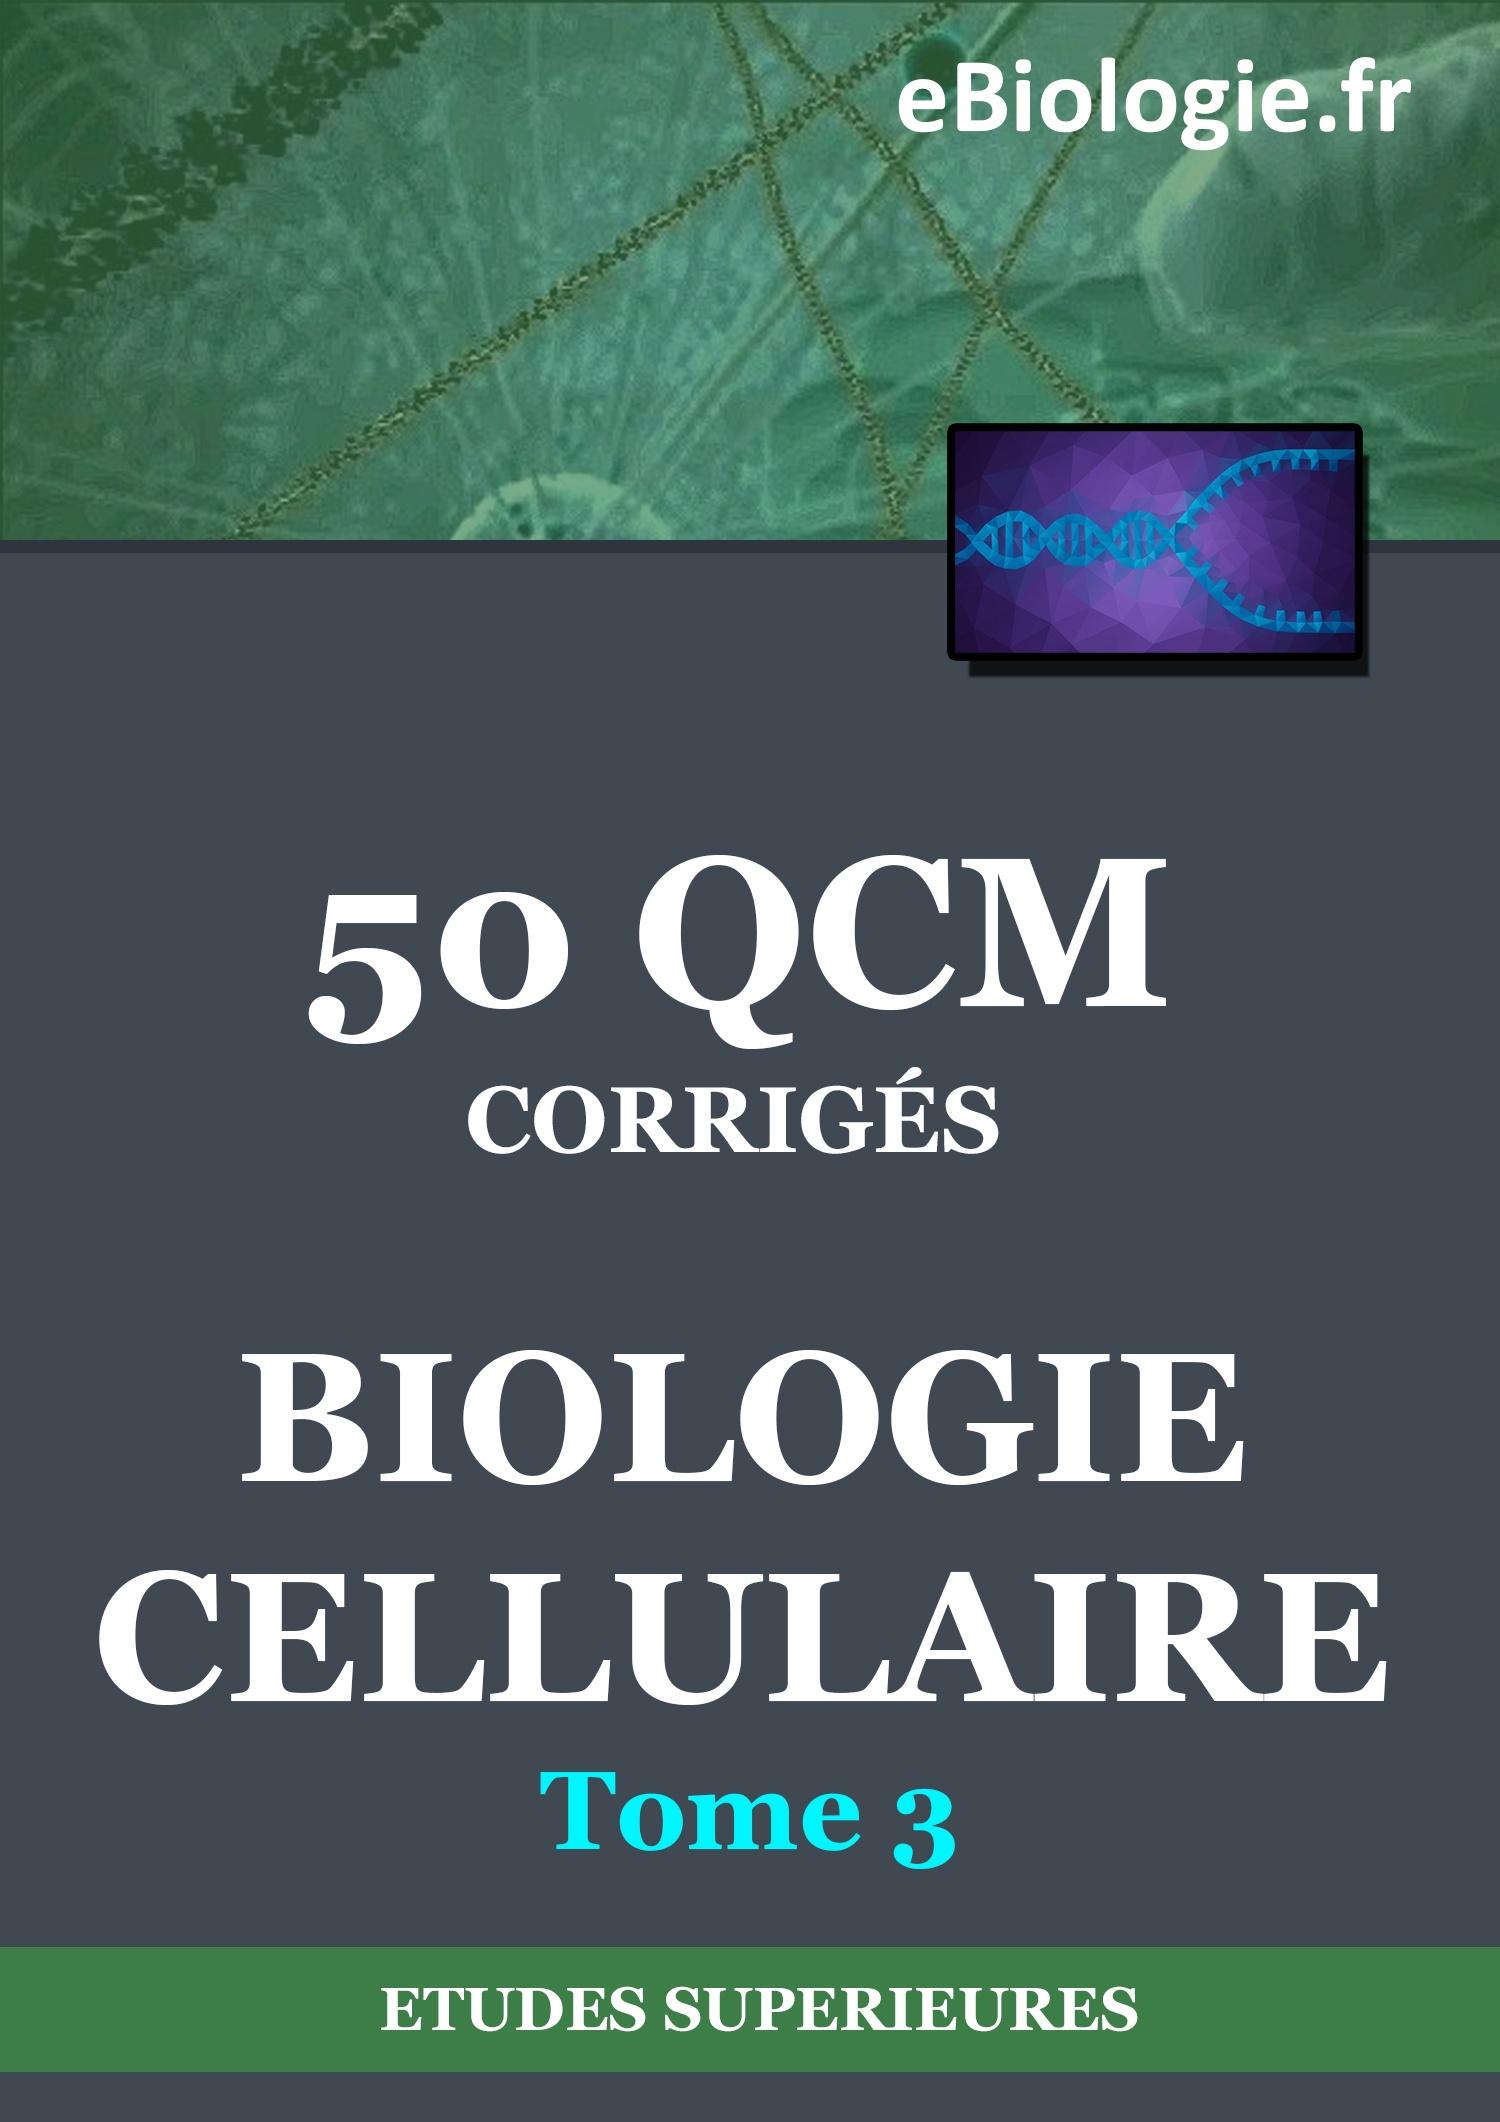 Ebook : eBook 50 QCM de Biologie cellulaire - Tome 3